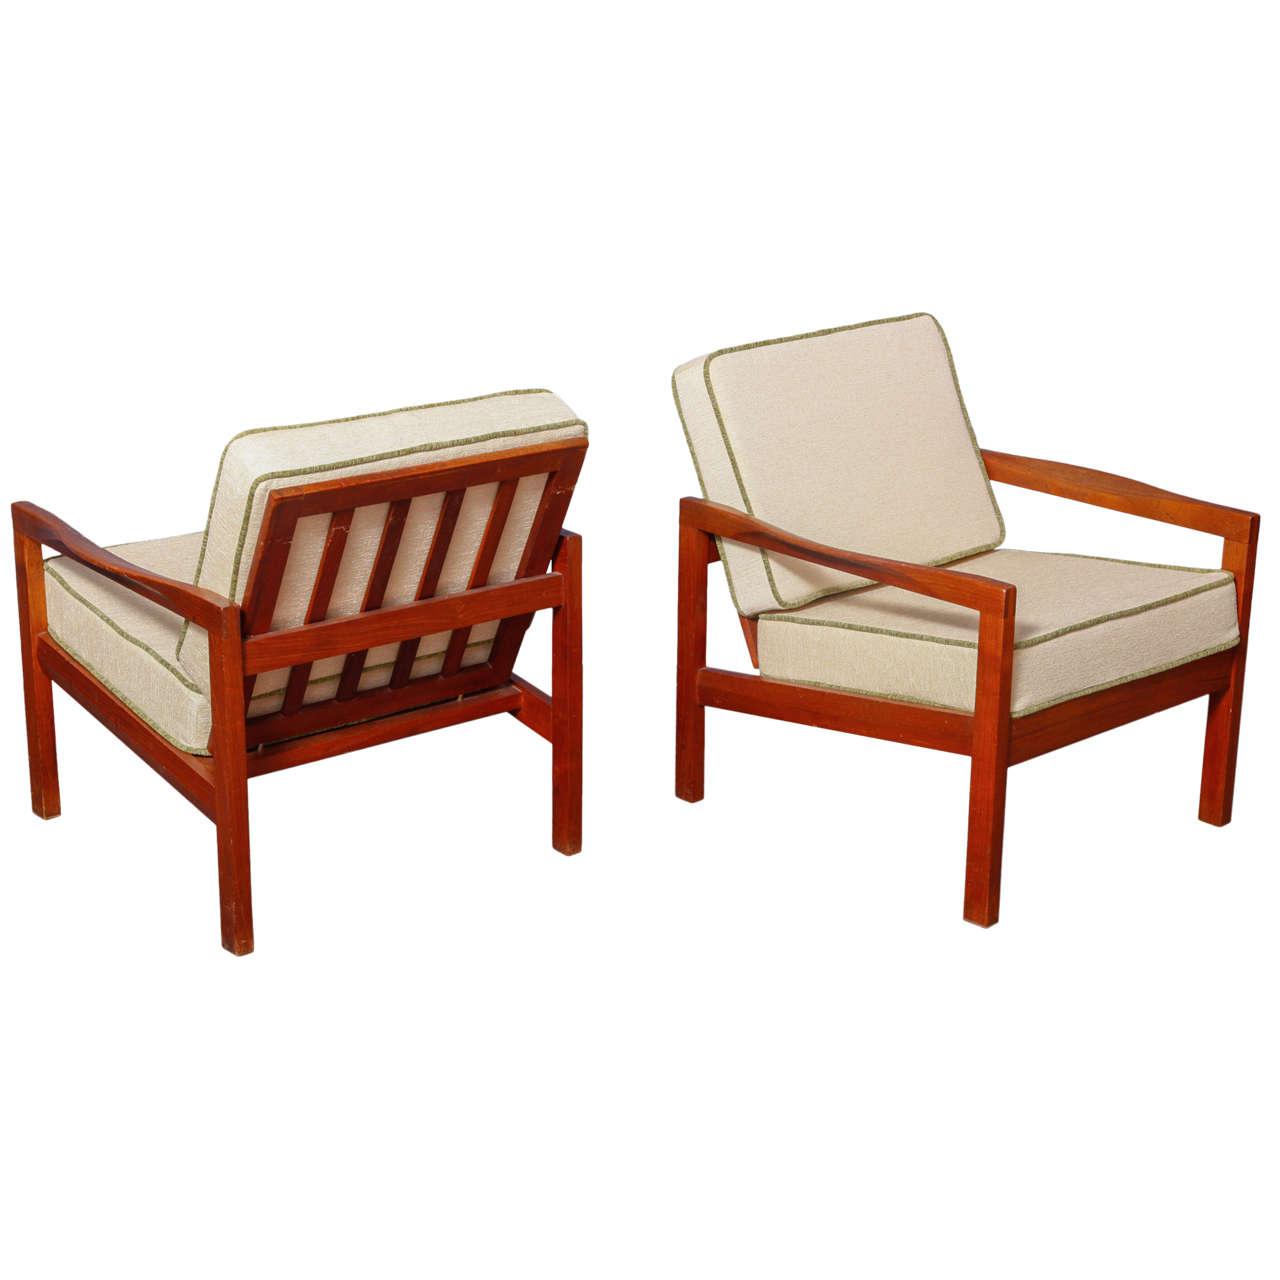 Pair of Greta Jalk Chairs